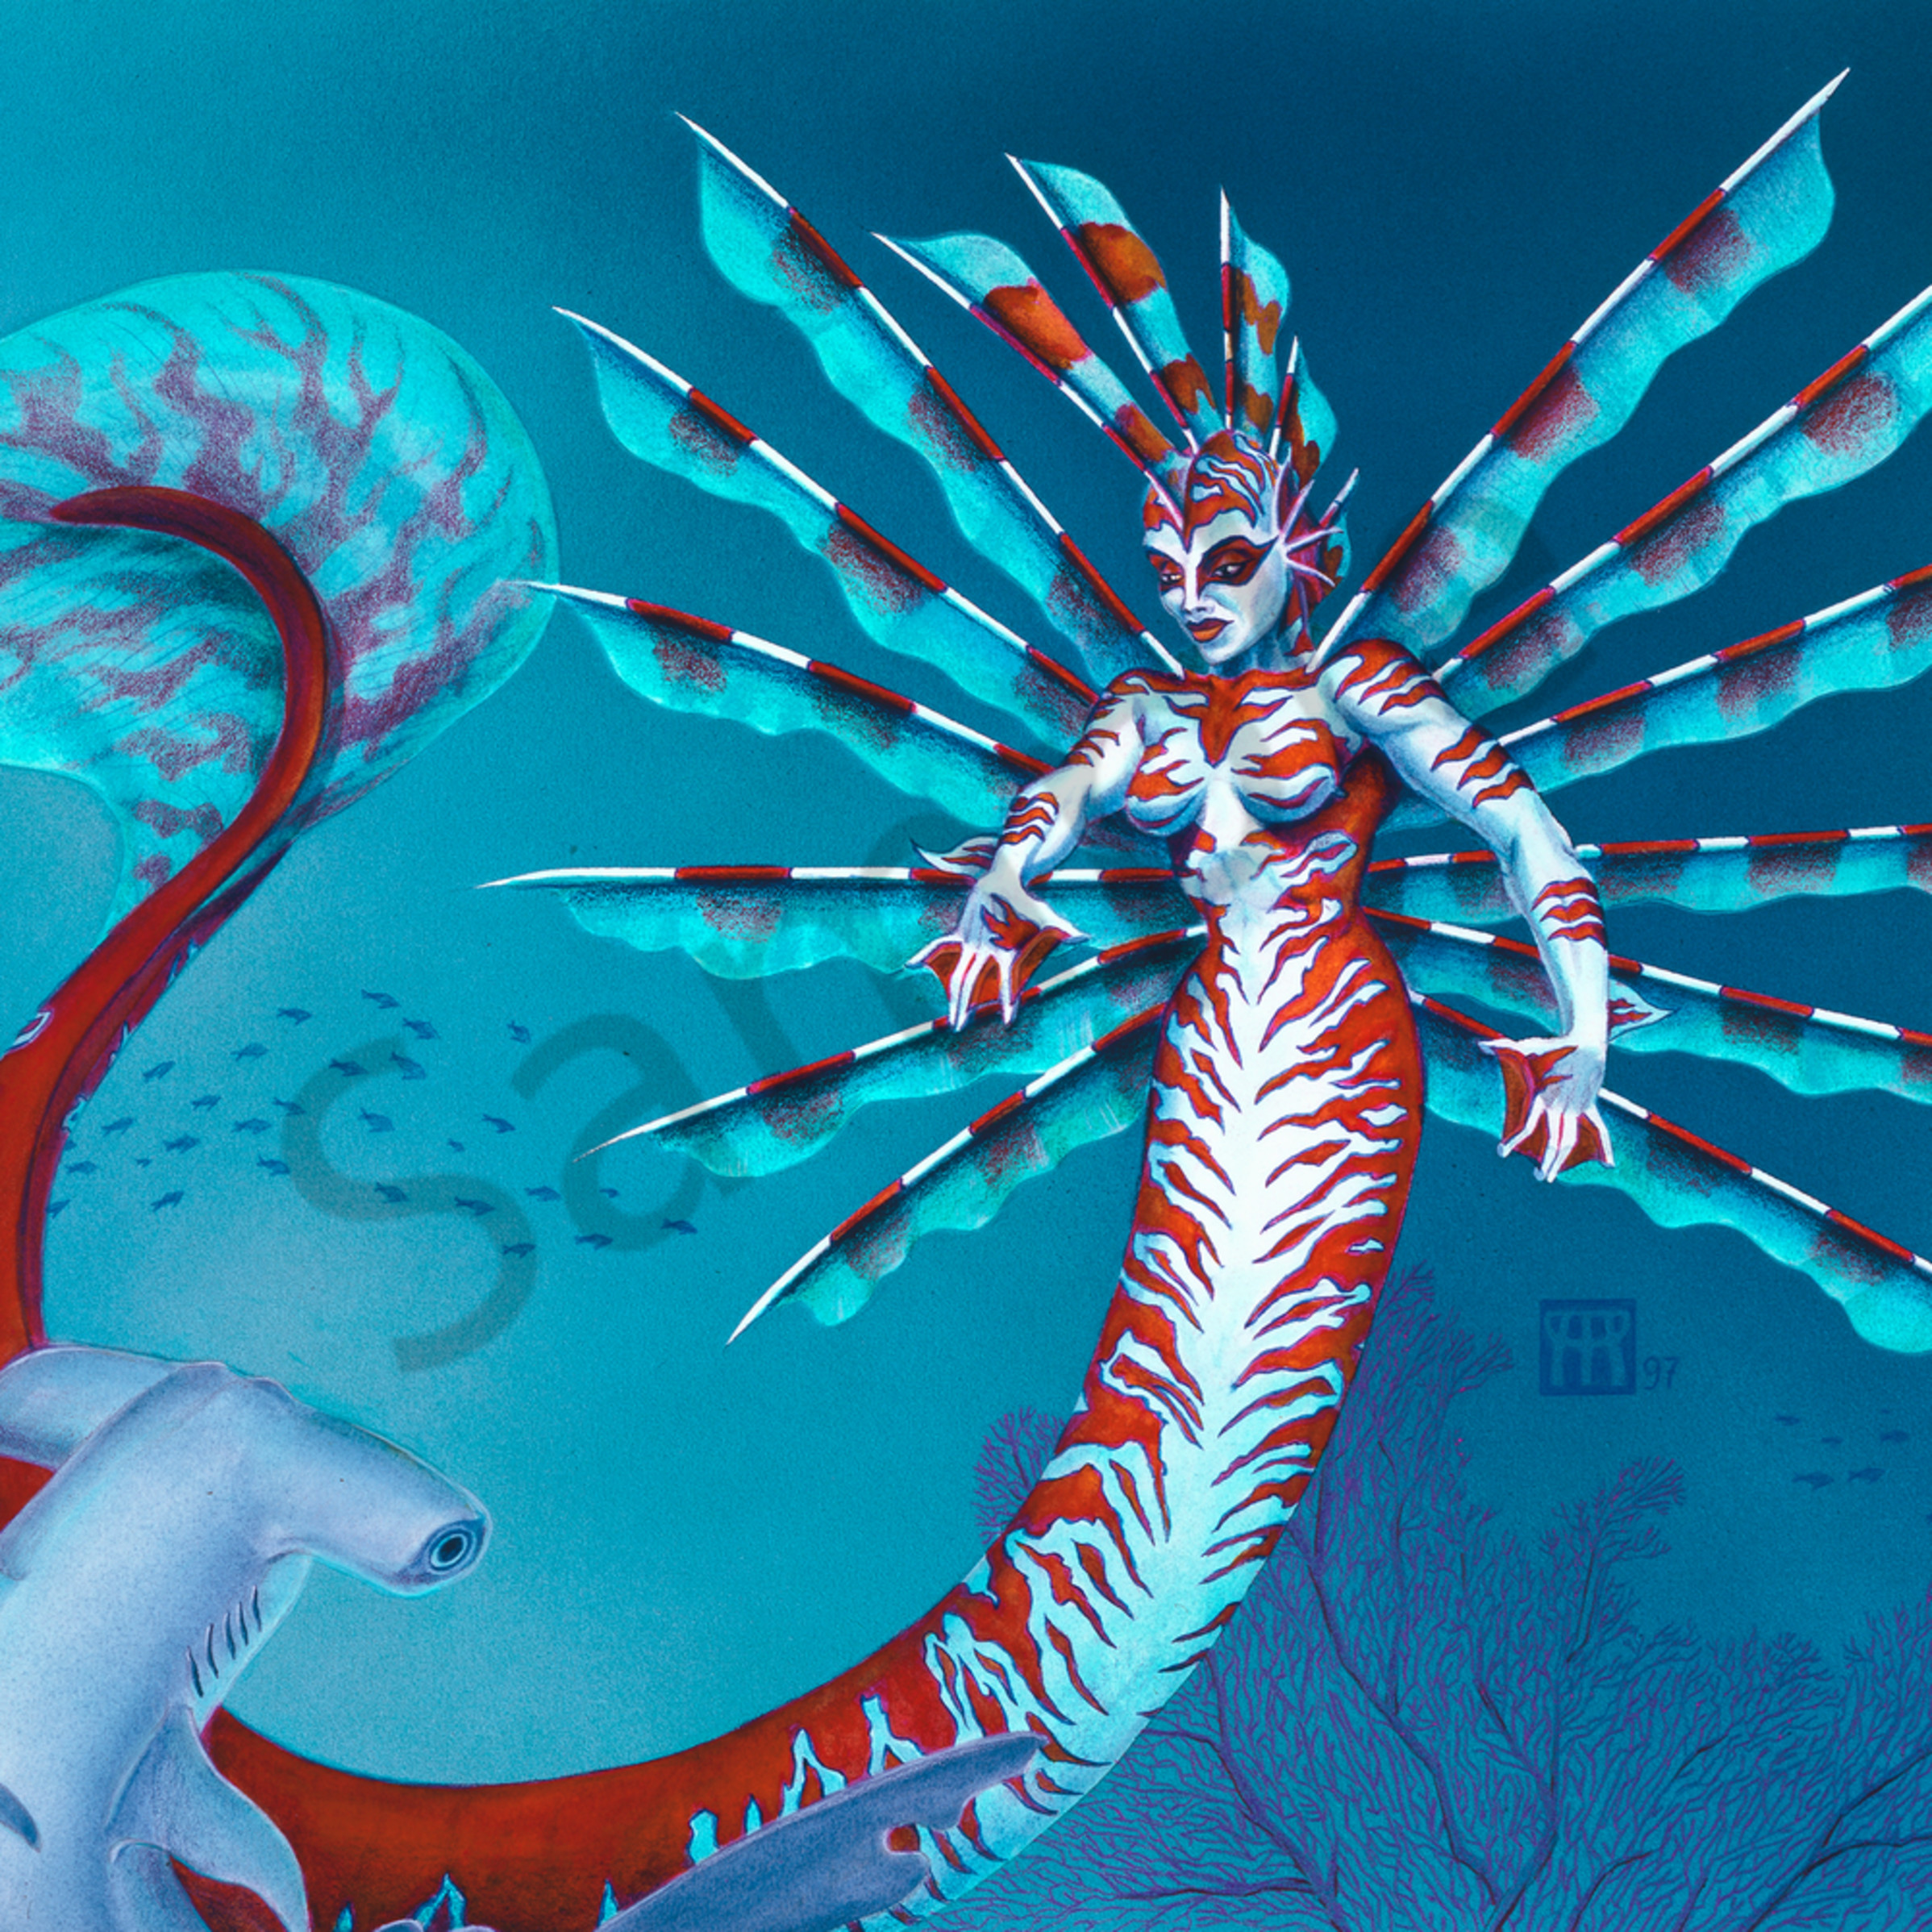 Mermaid with shark zfpvs1